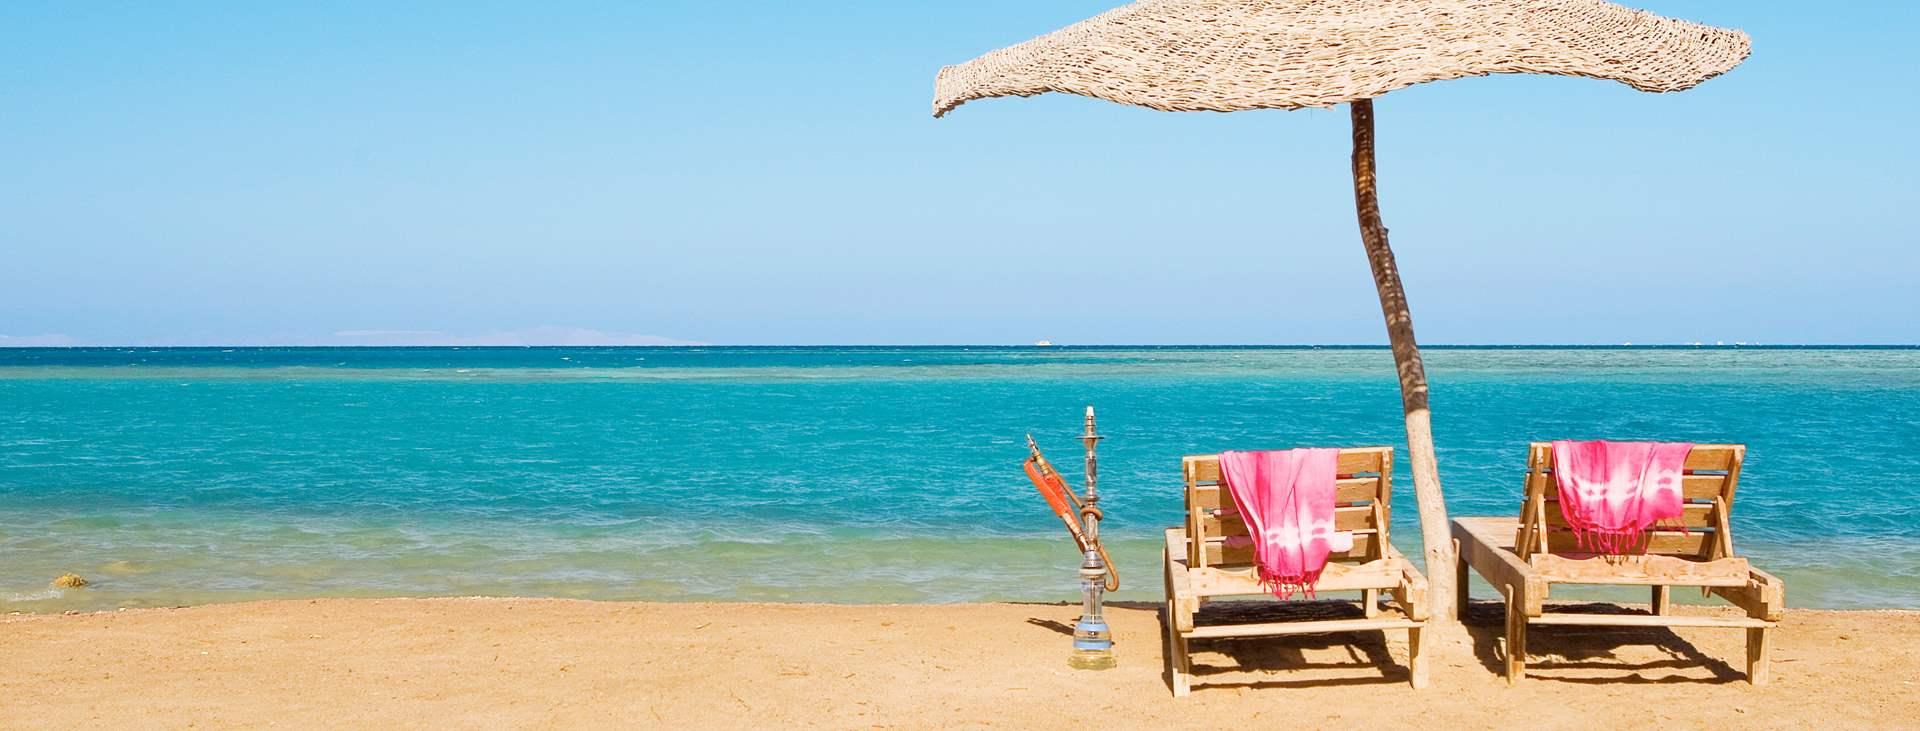 Resor till Hurghada med Ving